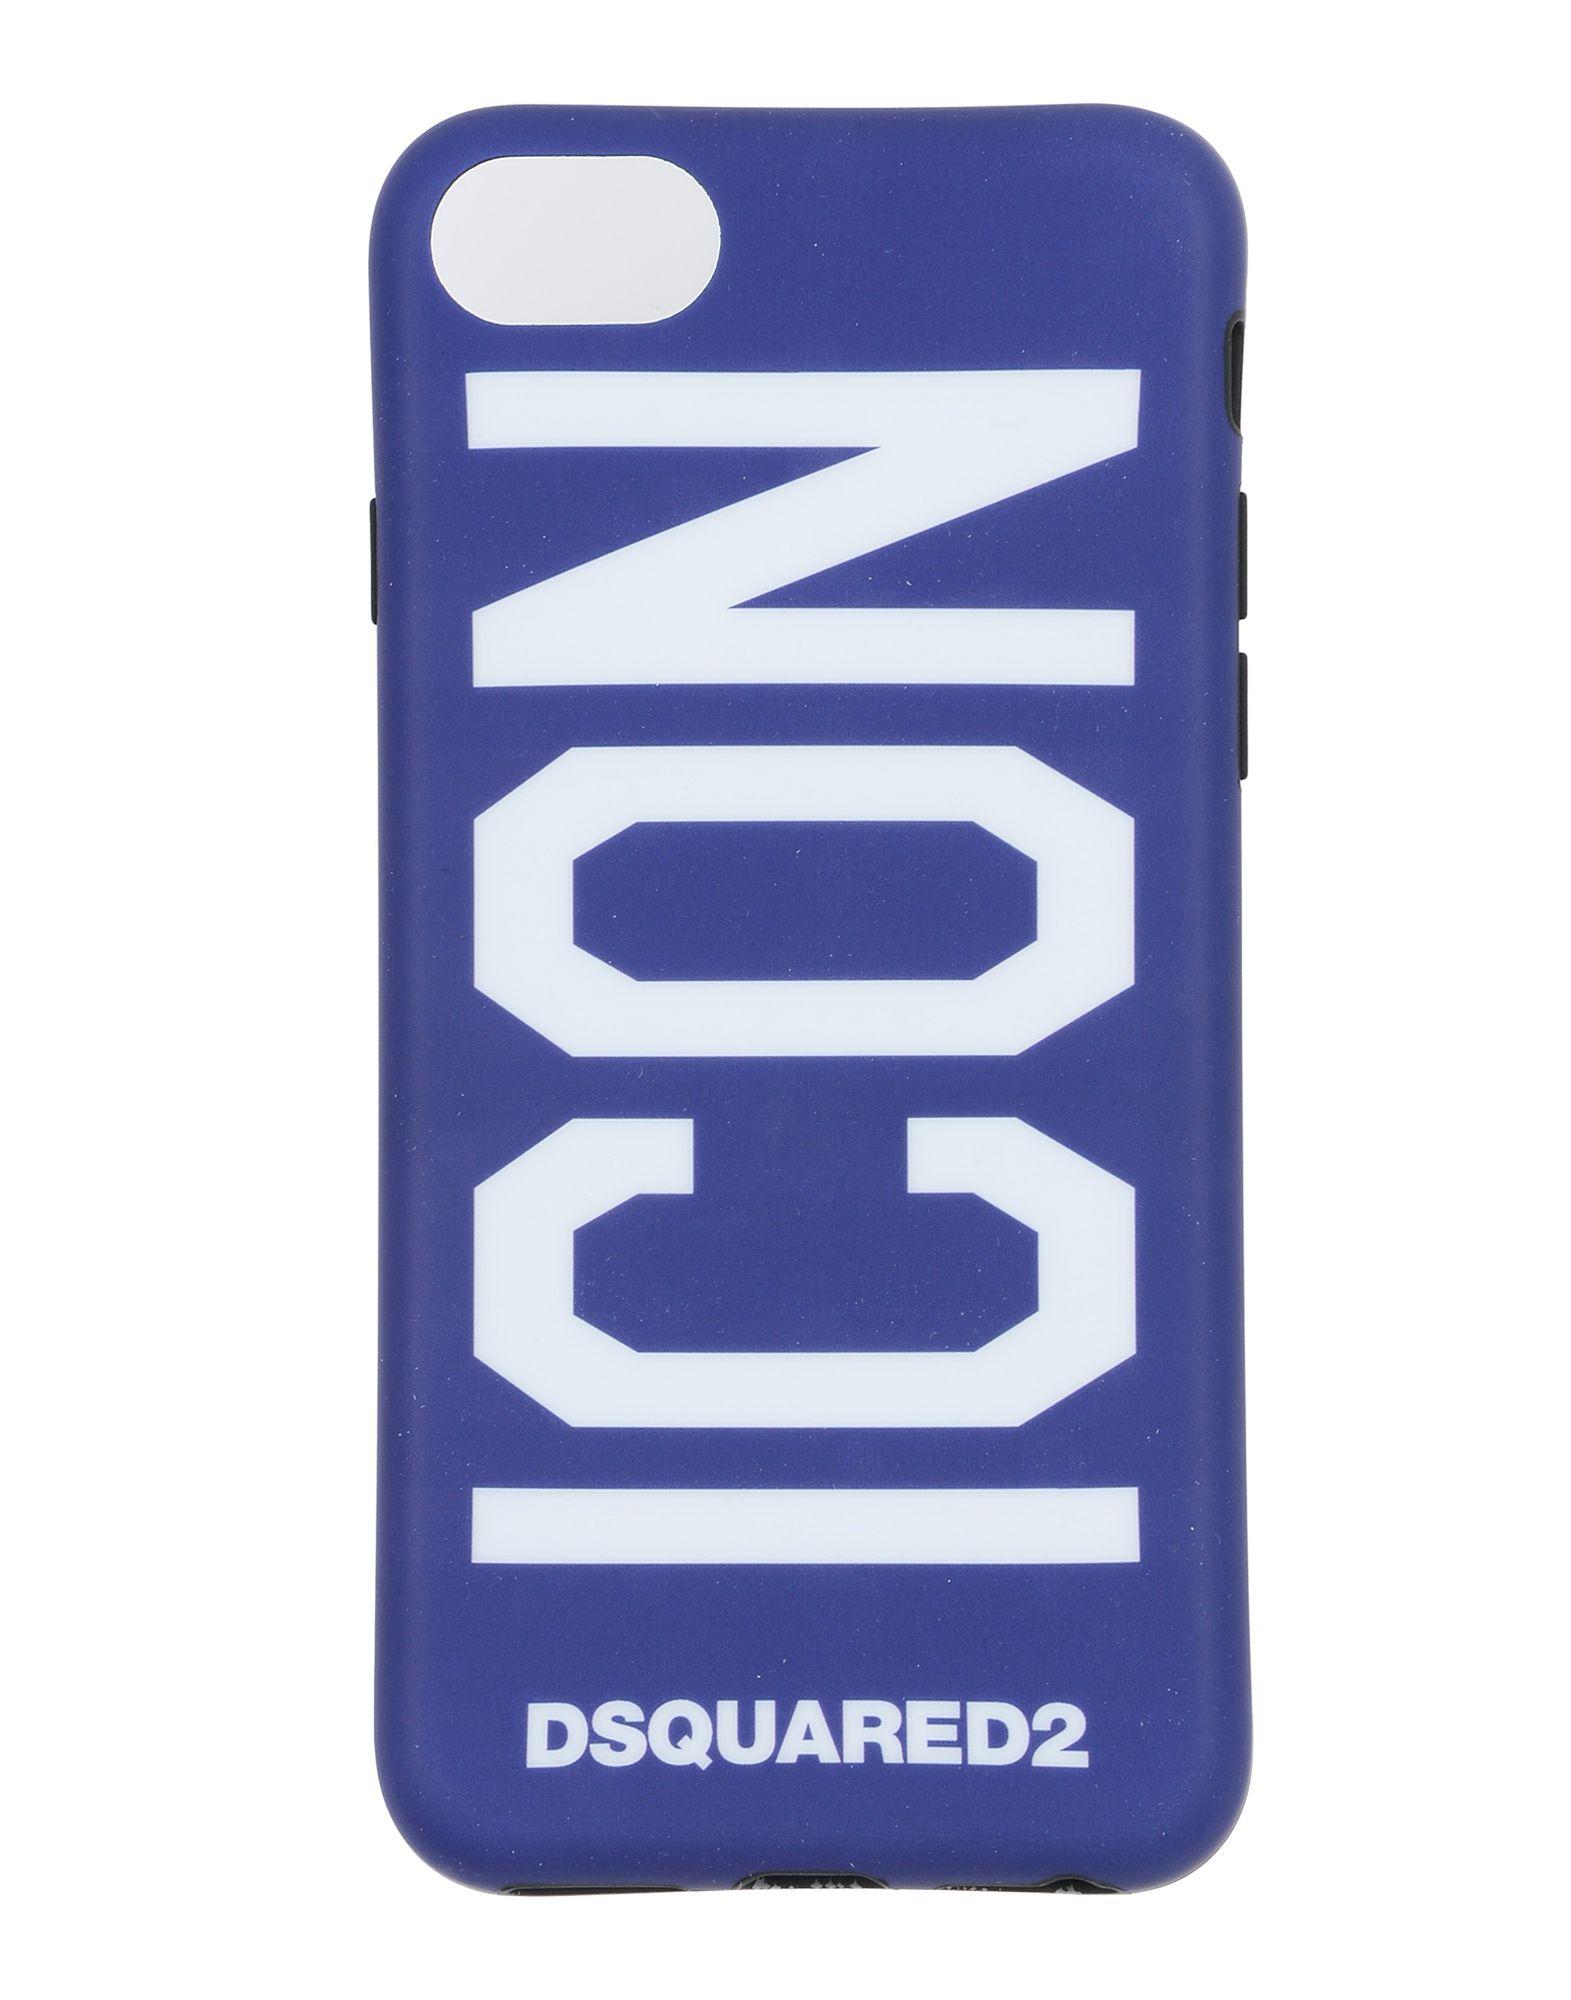 Фото - DSQUARED2 Чехол аксессуар чехол аккумулятор red line для apple iphone 6 6s 7 power case 6000 mah gold ут000010676